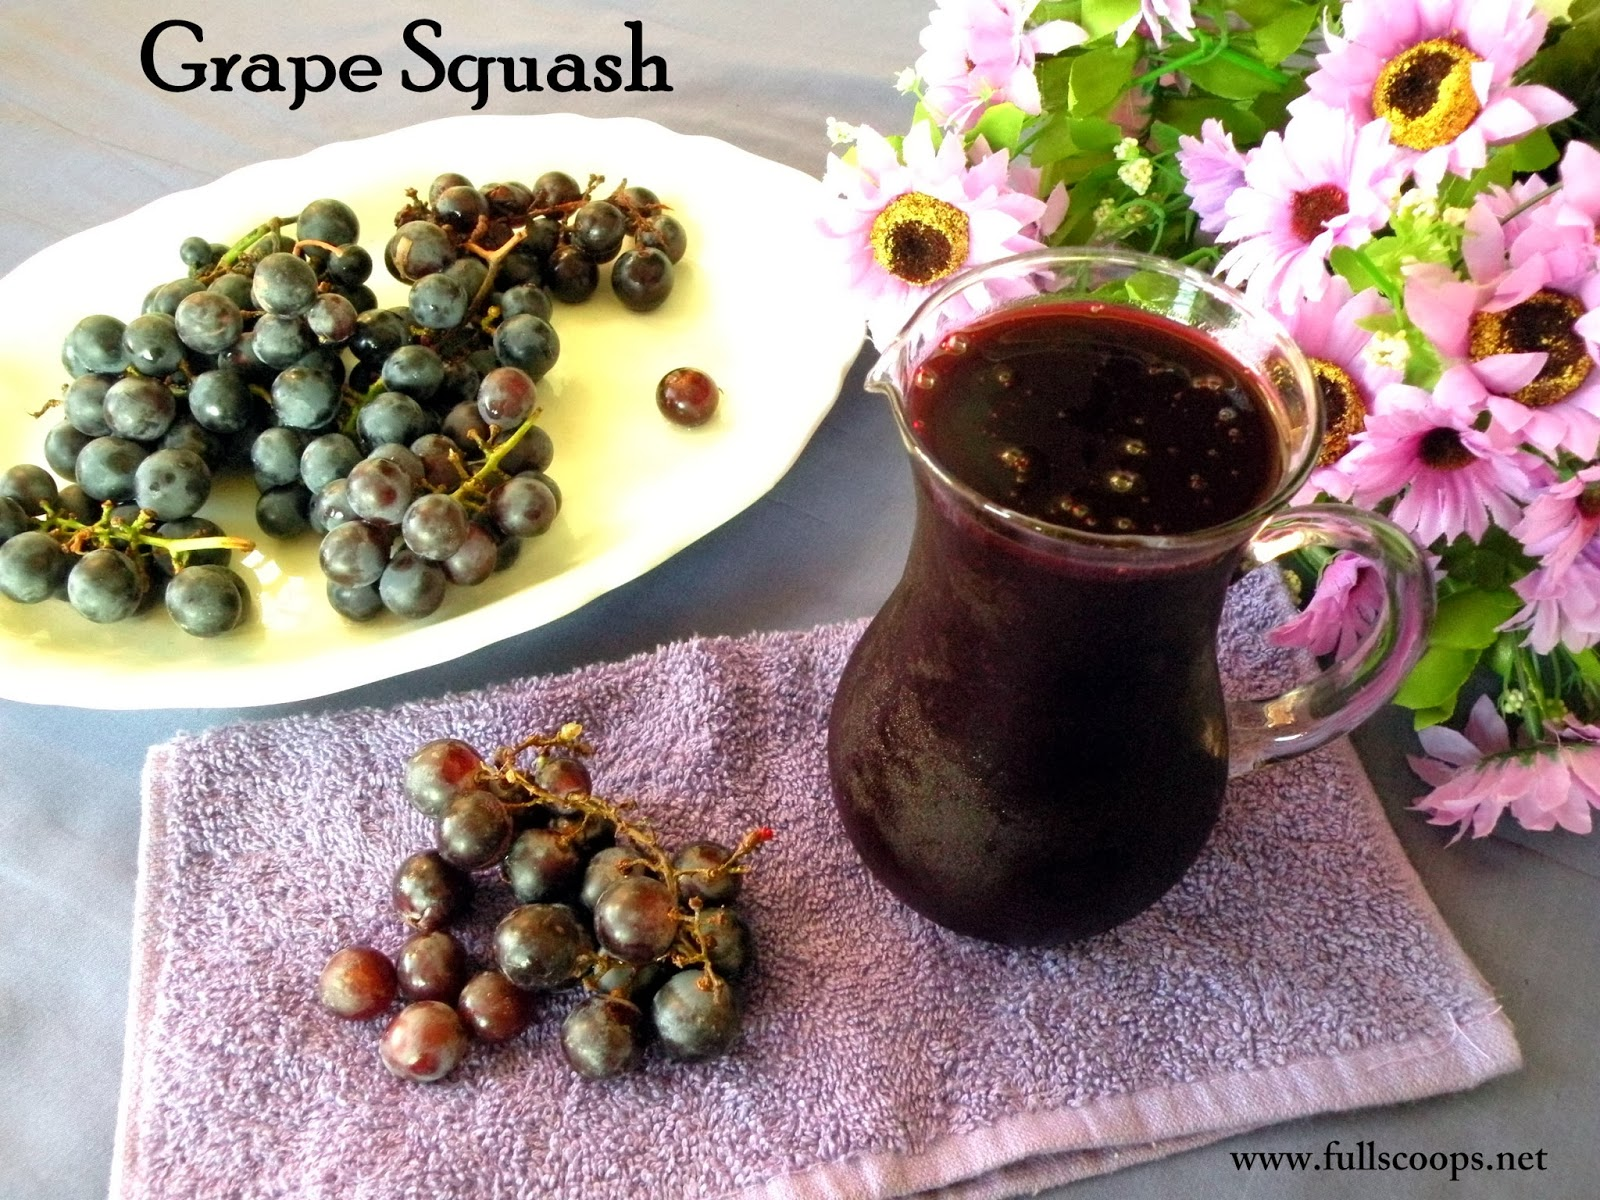 Grape Squash